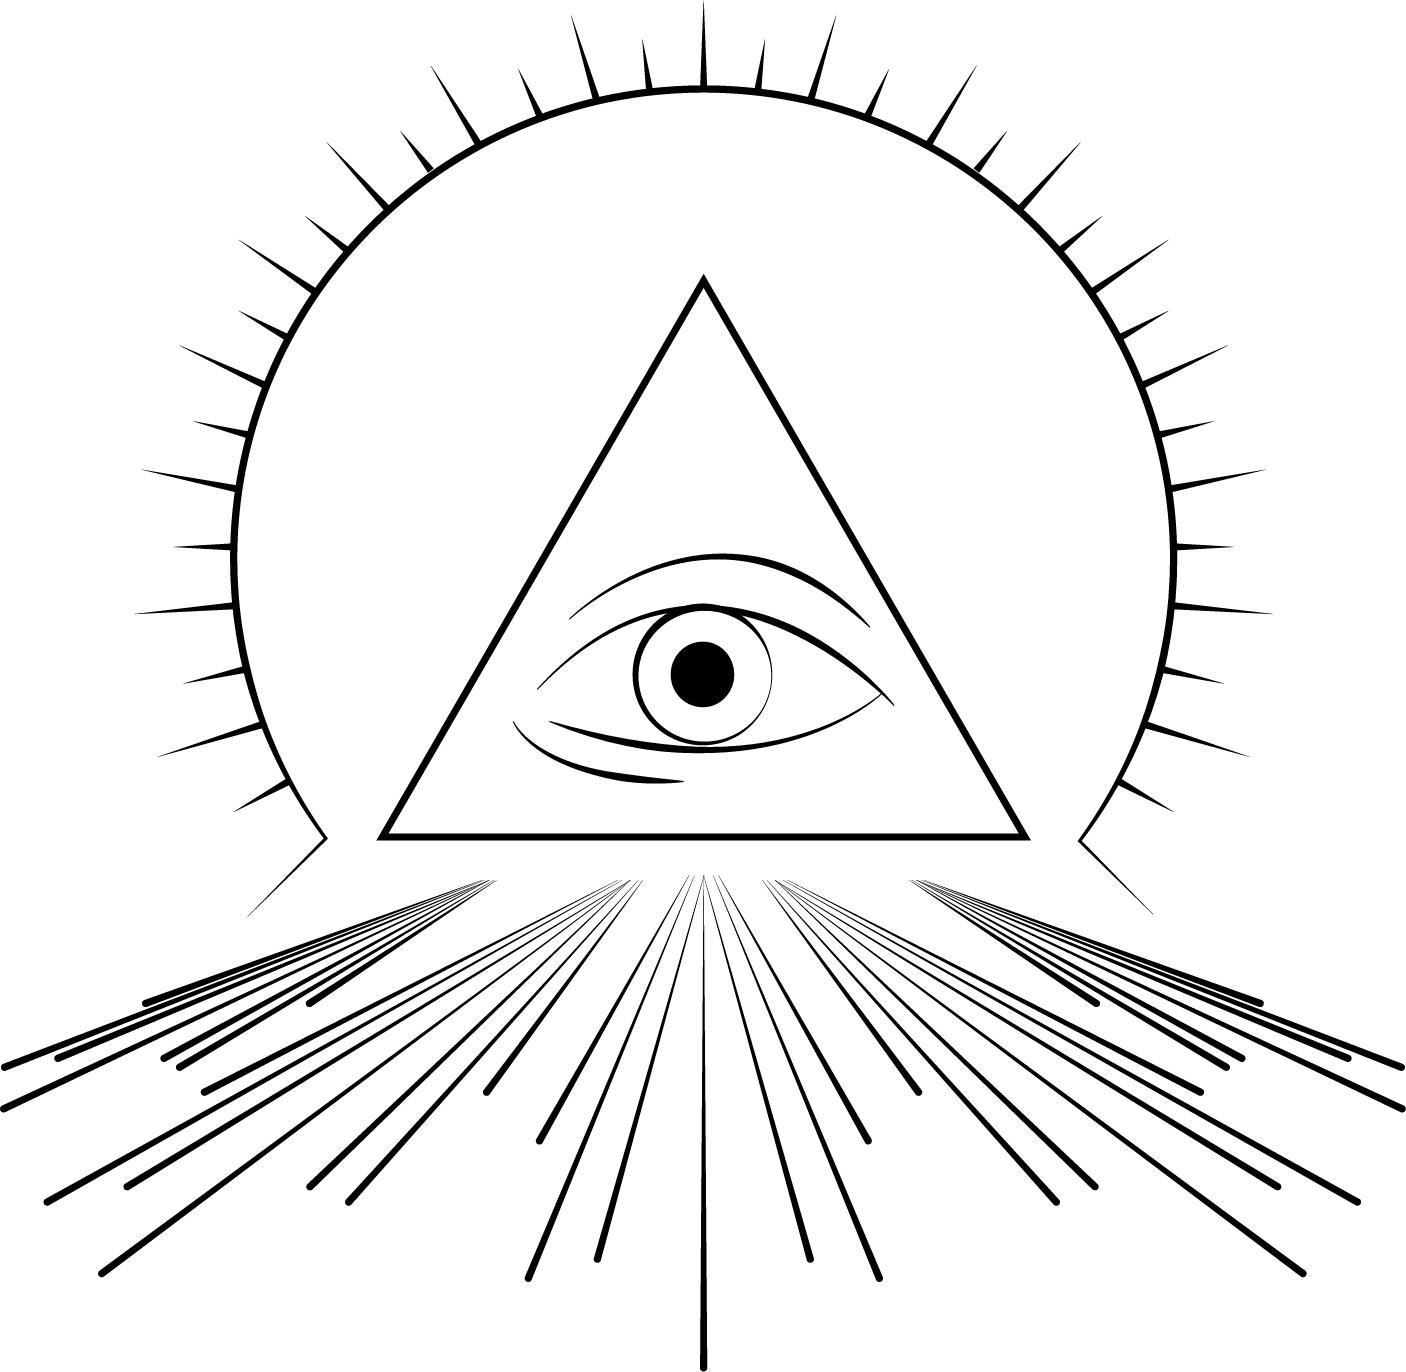 BLOODLINES OF THE ILLUMINATI  Whale